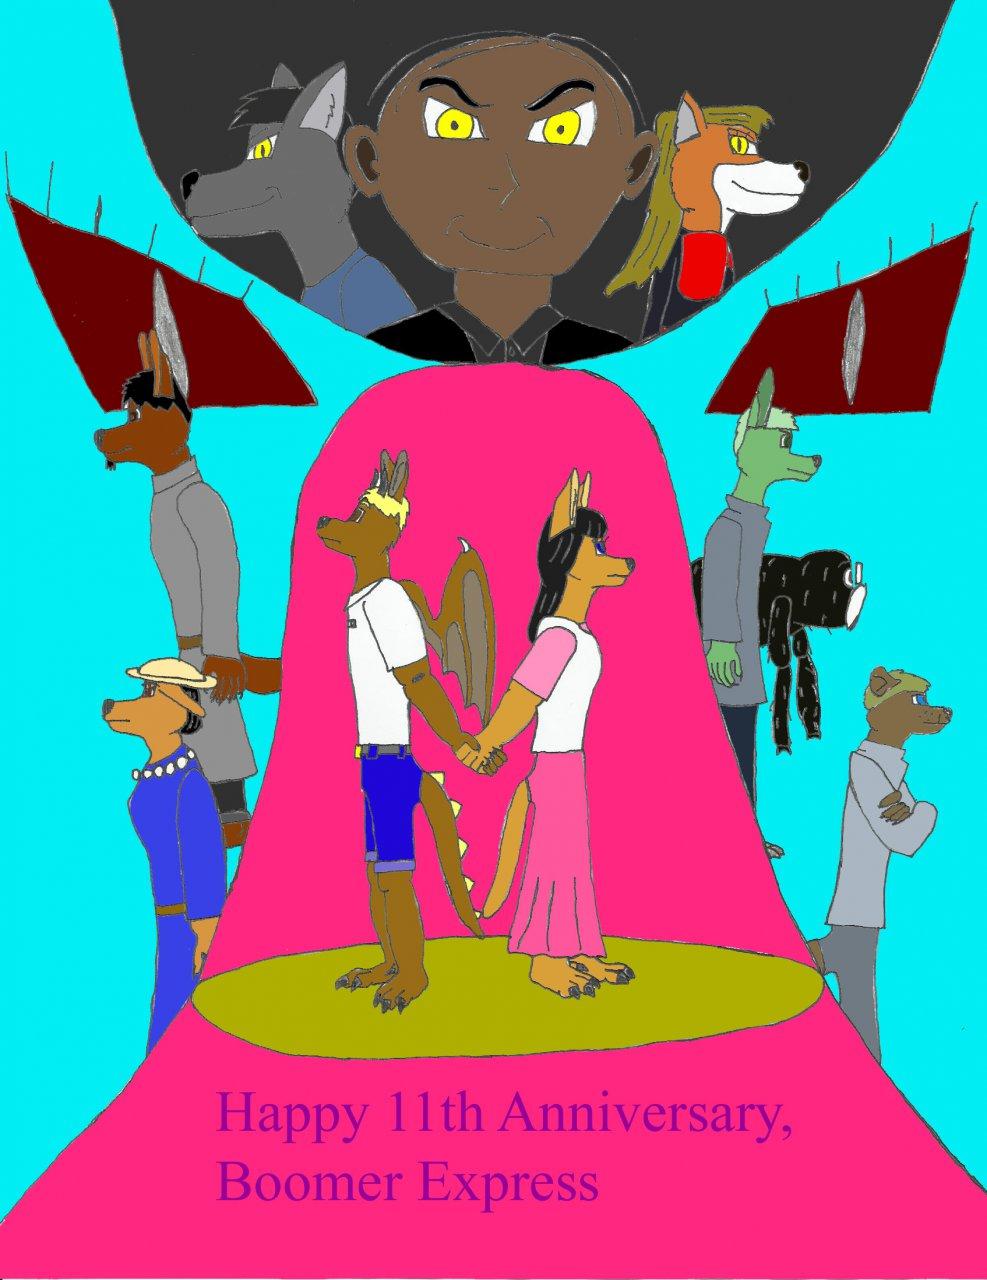 vitotalford_boomer_express_11th_anniversary